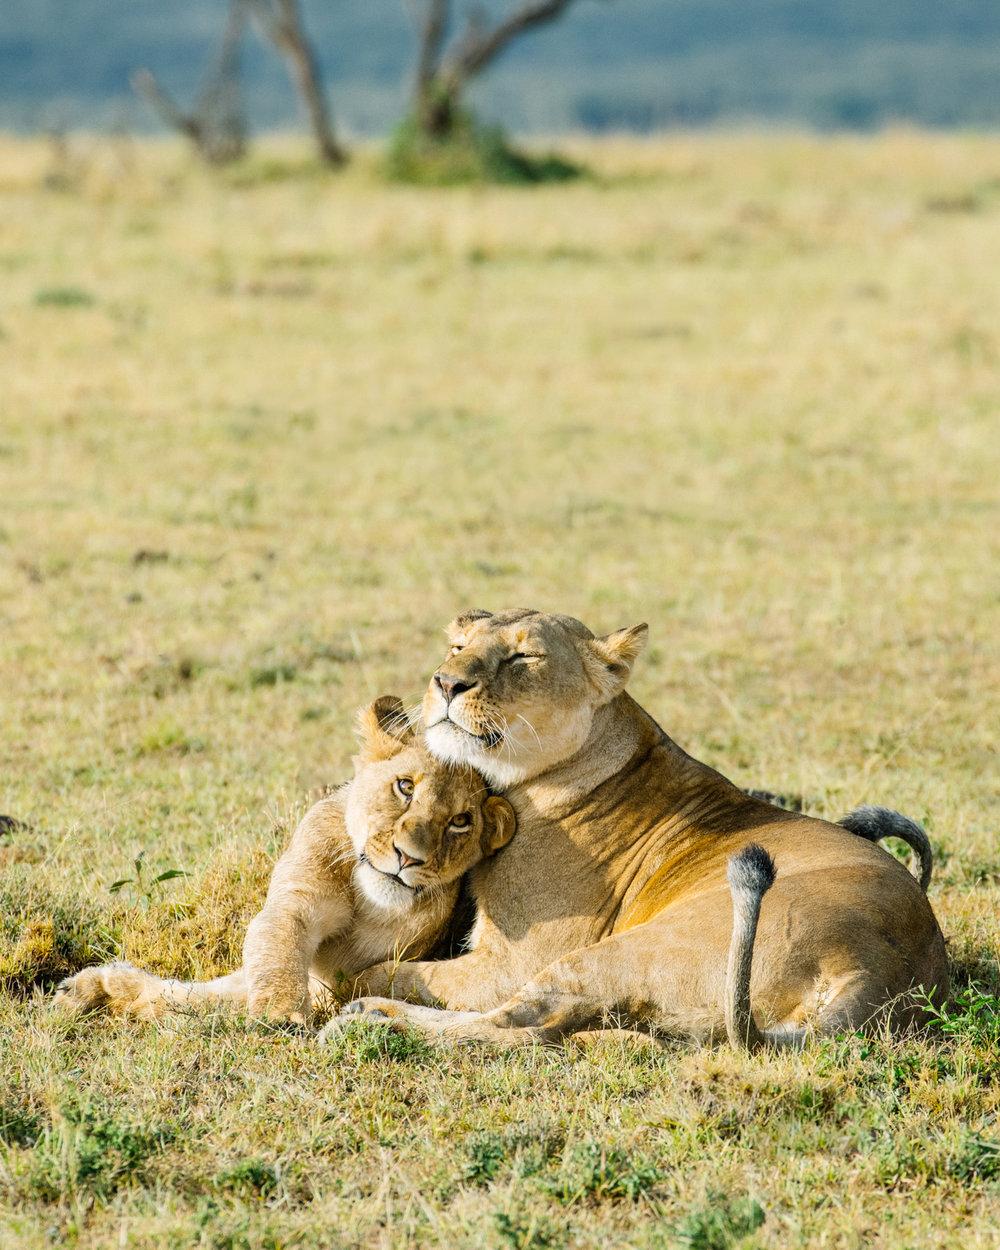 KenyaFeb2019_Safari-251.jpg